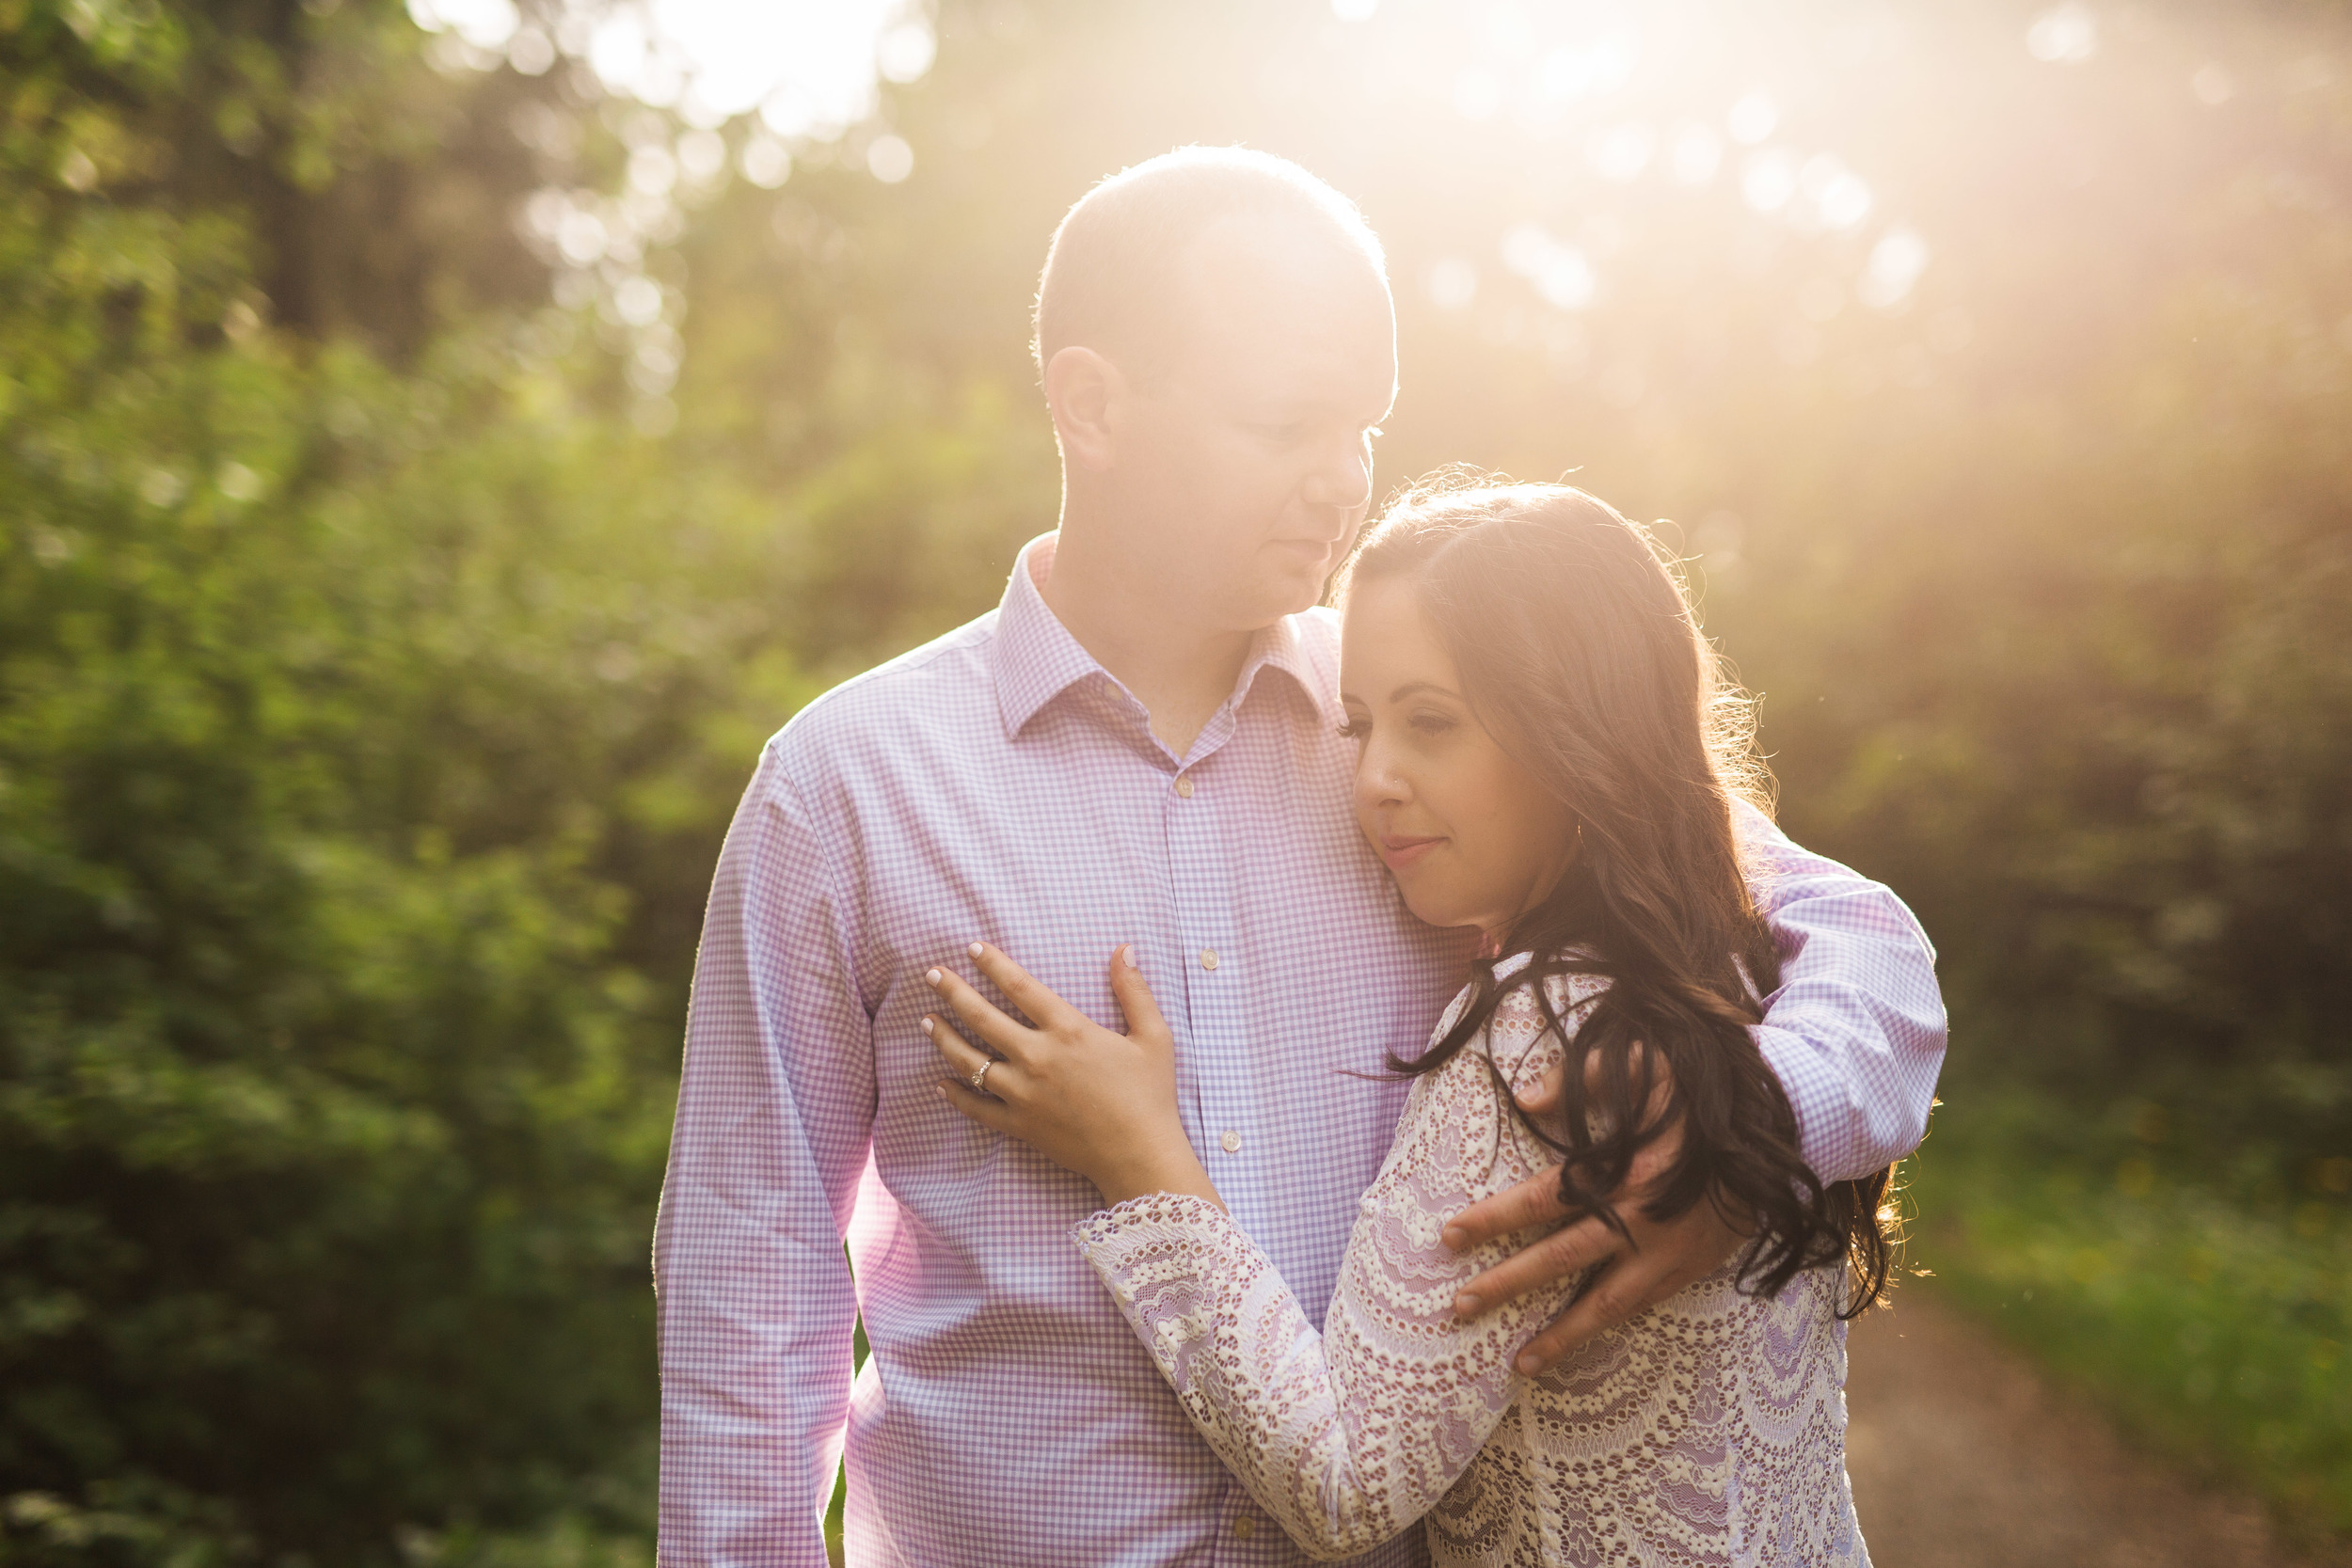 Vancouver Wedding Photographer, Jennifer Picard Photography, Stanley Park Engagement Session